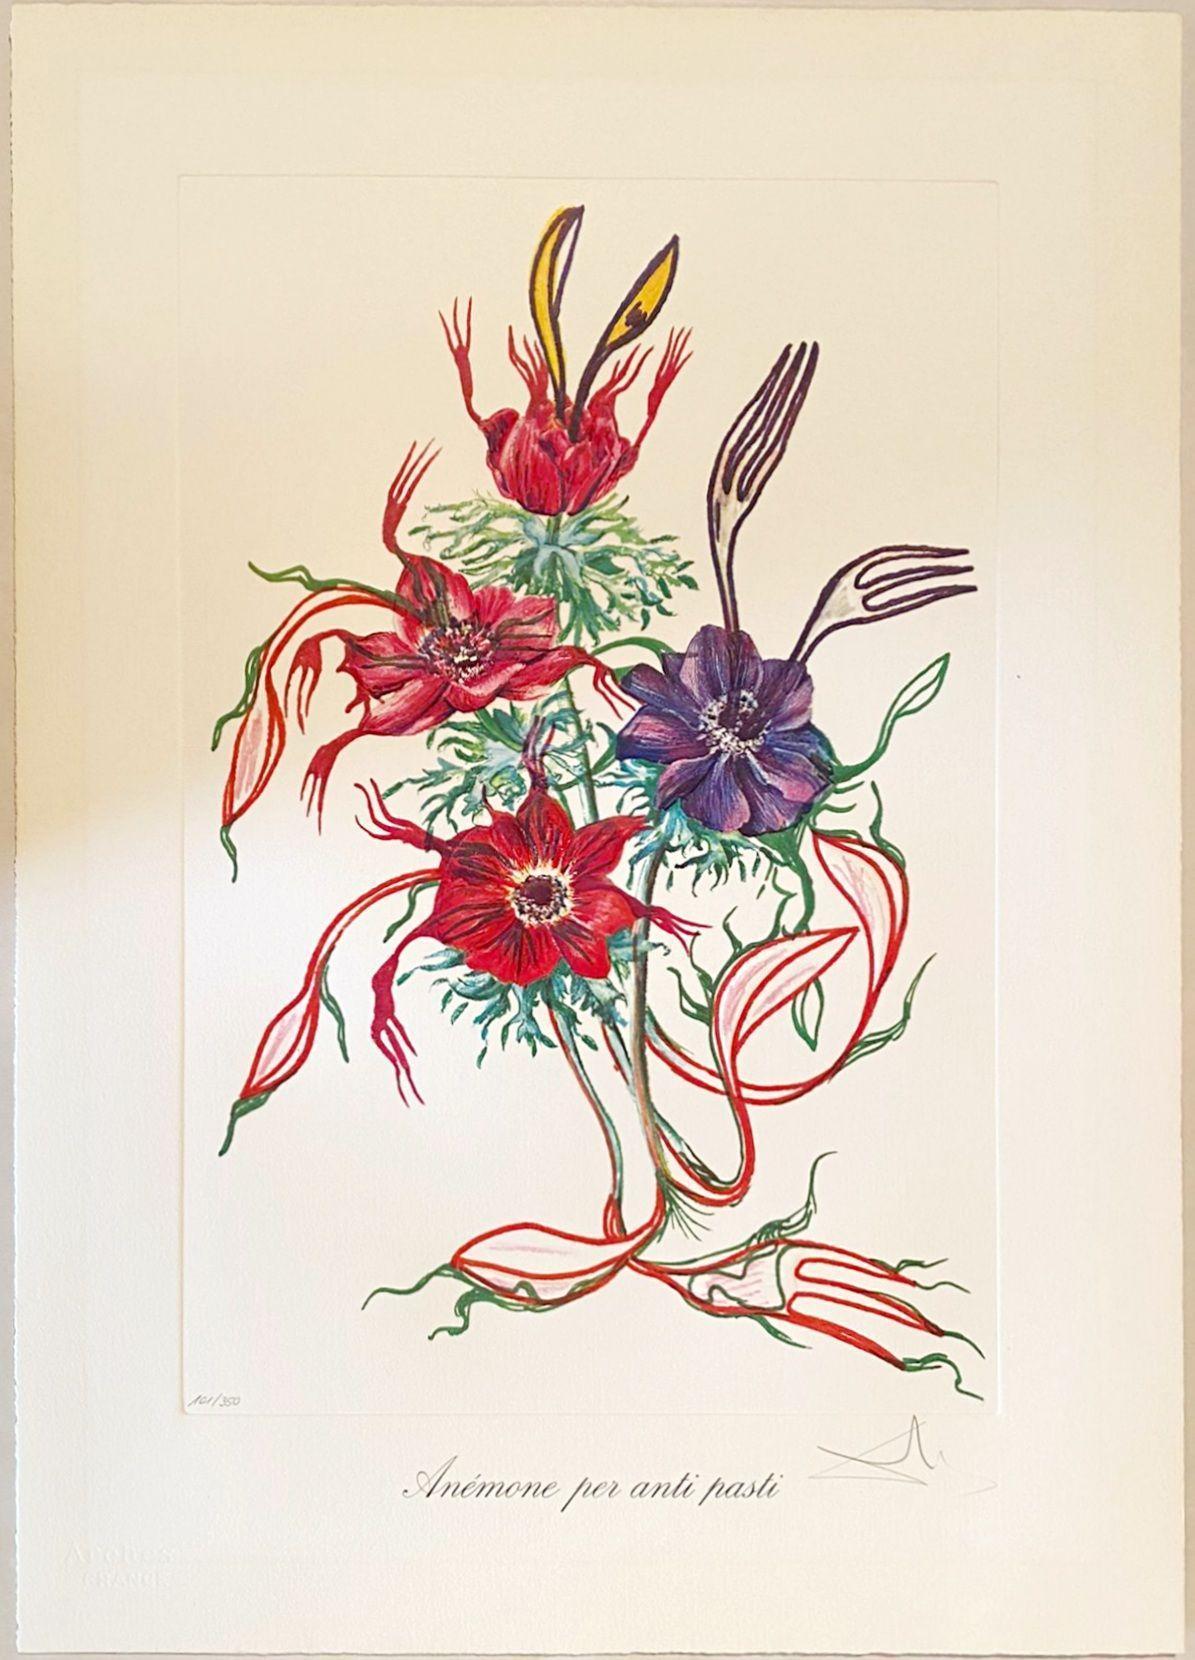 Salvador Dalí - Anemone per anti-pasti, 1972